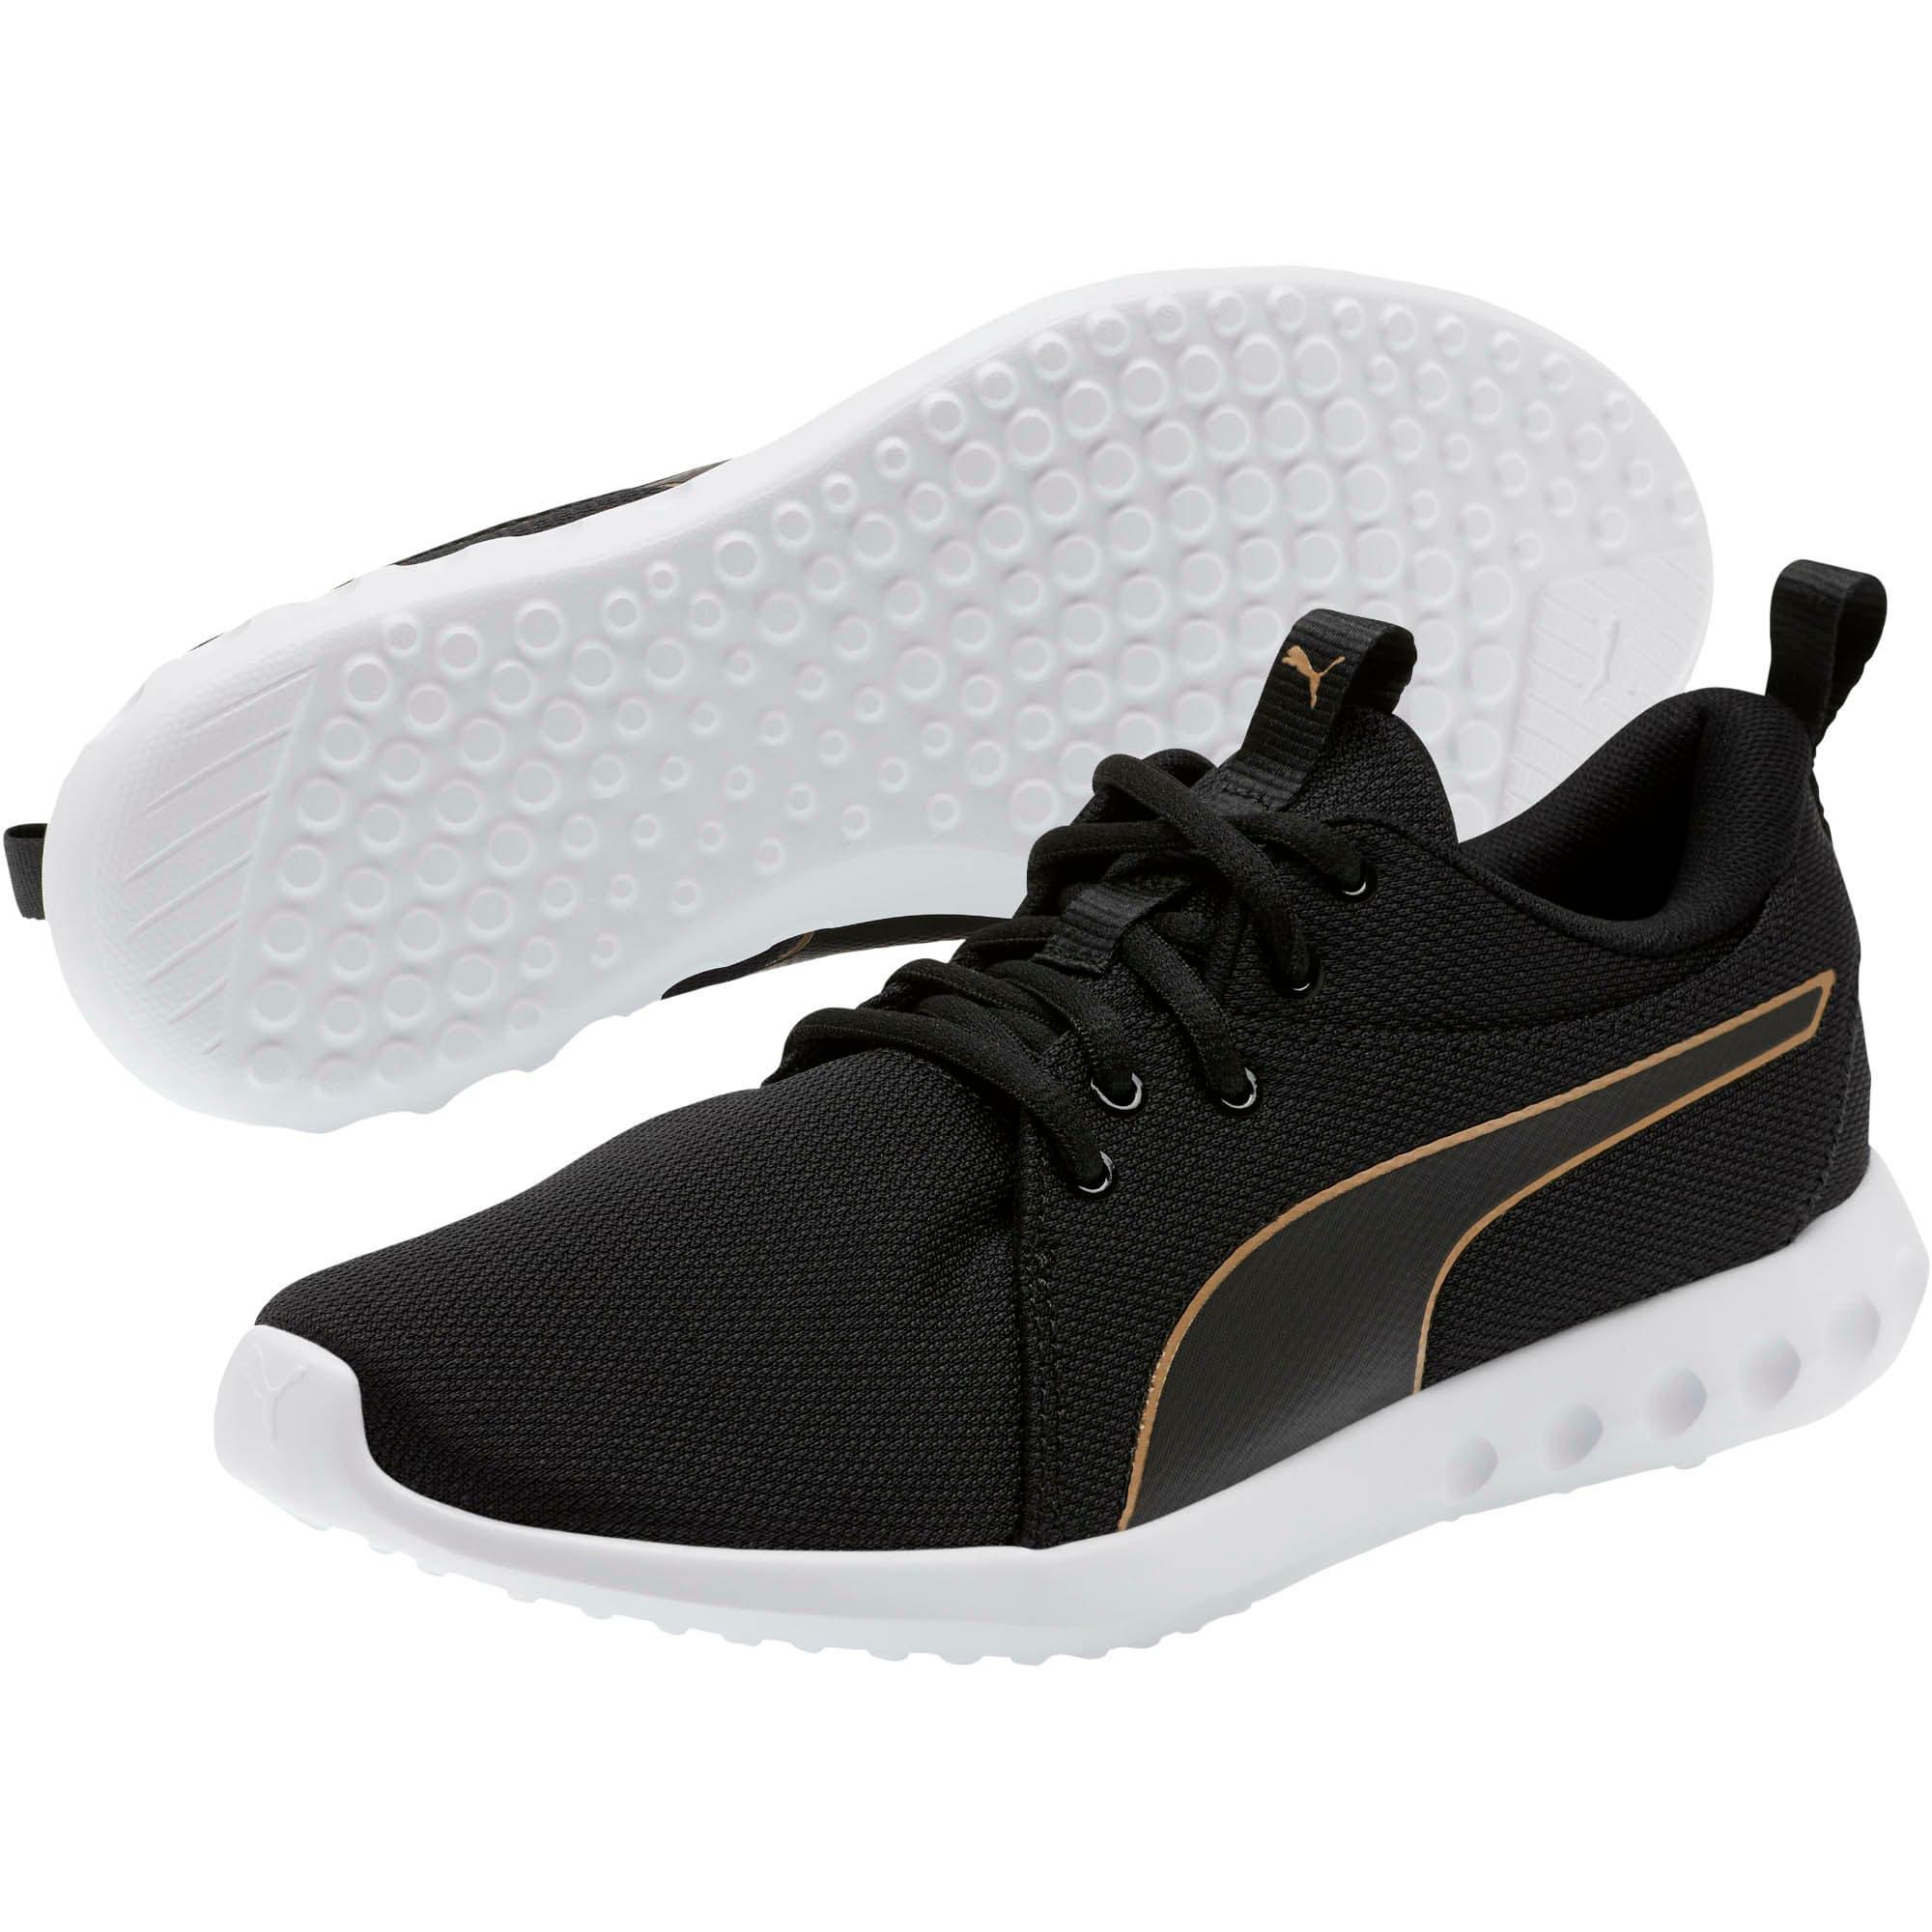 Thumbnail 2 of Carson 2 Cosmo Women's Running Shoes, Puma Black-Metallic Gold, medium